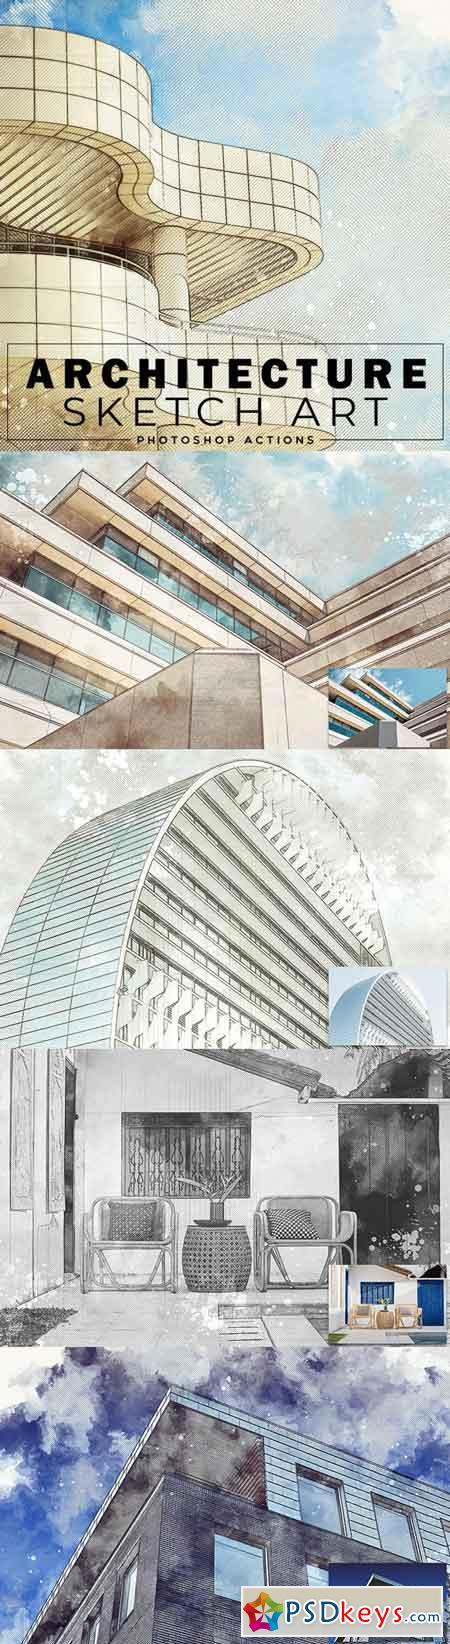 Architecture Sketch Art Photoshop Actions 22797617